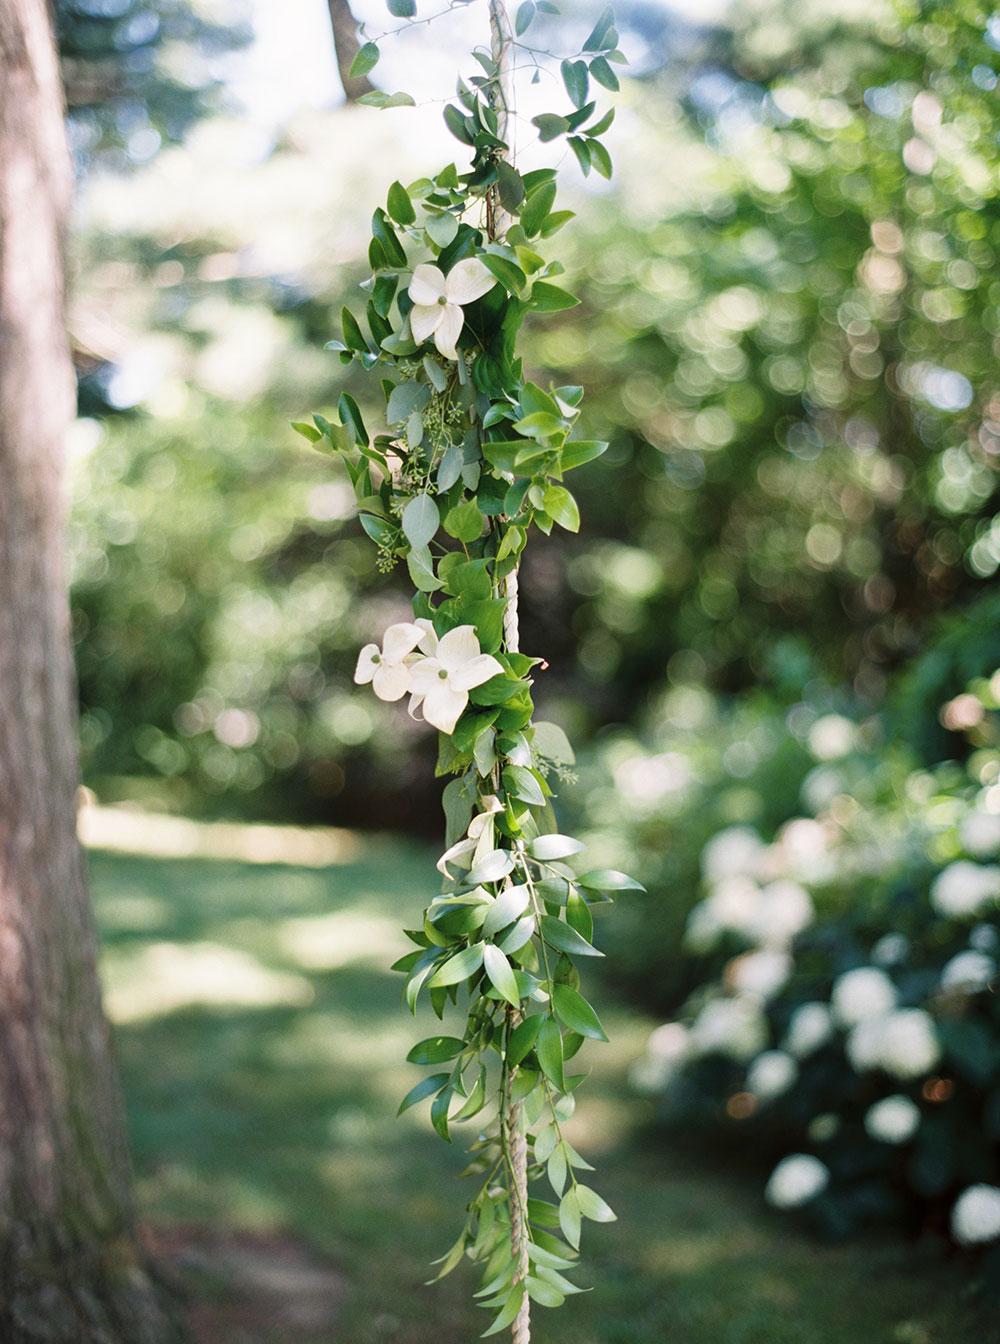 kurtz-orchards-wedding-gracewood-estate-niagara-on-the-lake-photo-by-katie-nicolle-photography-0017.JPG